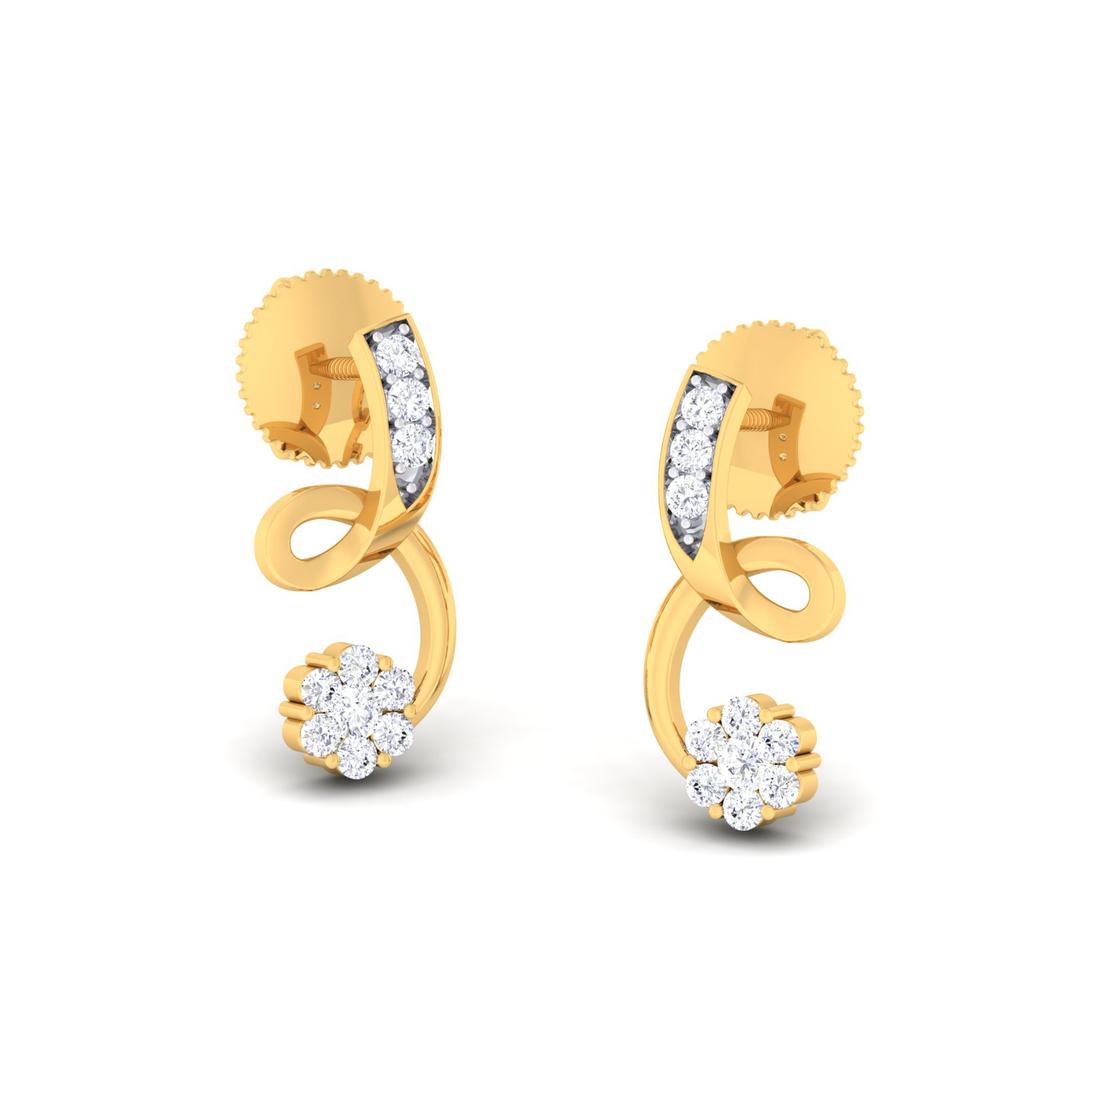 Arkina Diamond's Exquisite entangled earrings